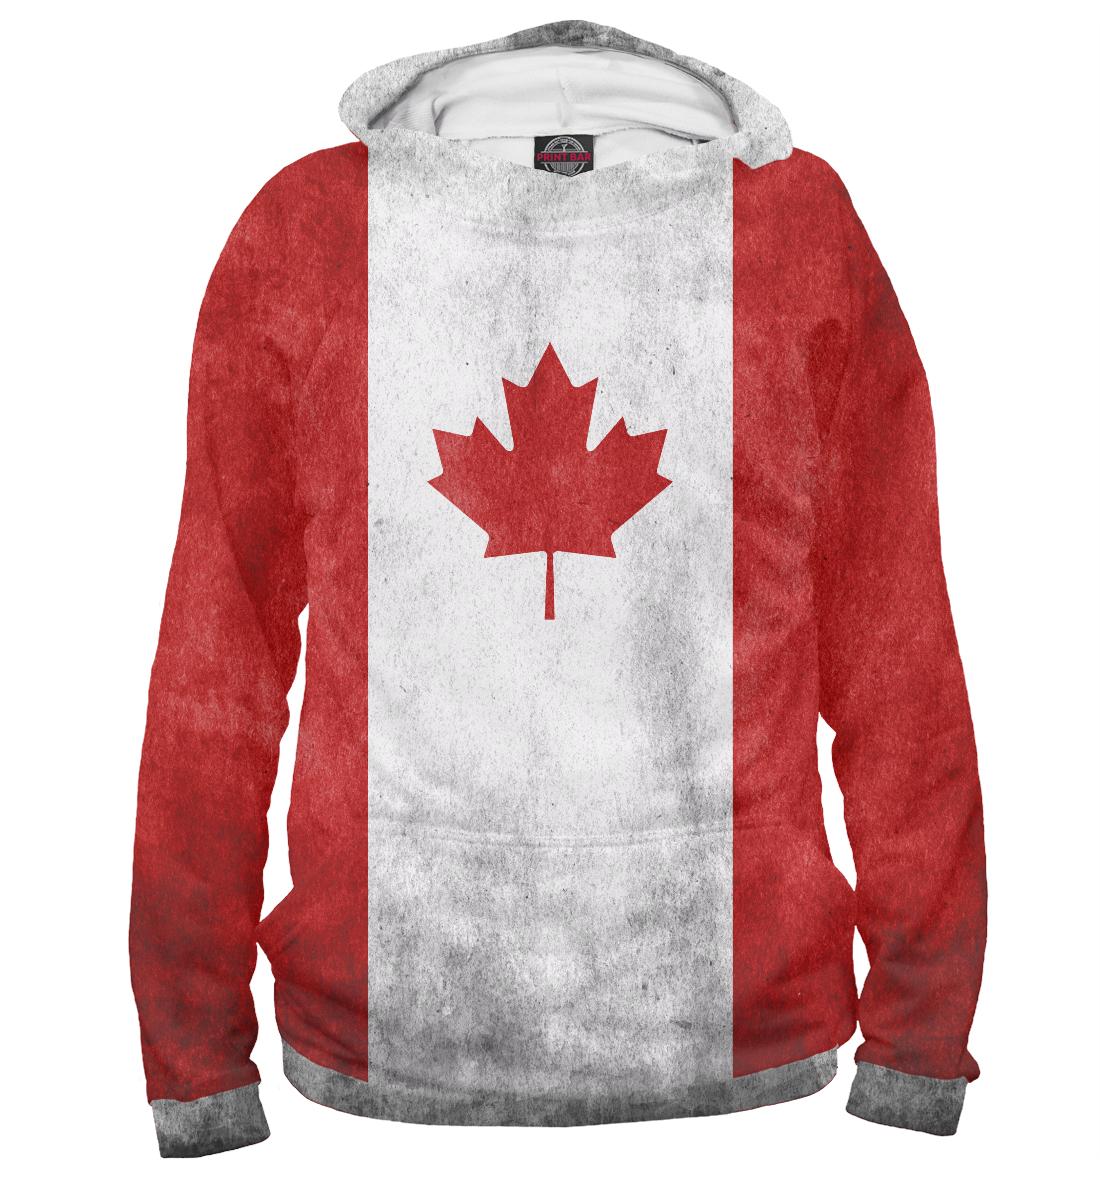 Купить Флаг Канады, Printbar, Худи, CTS-110169-hud-2